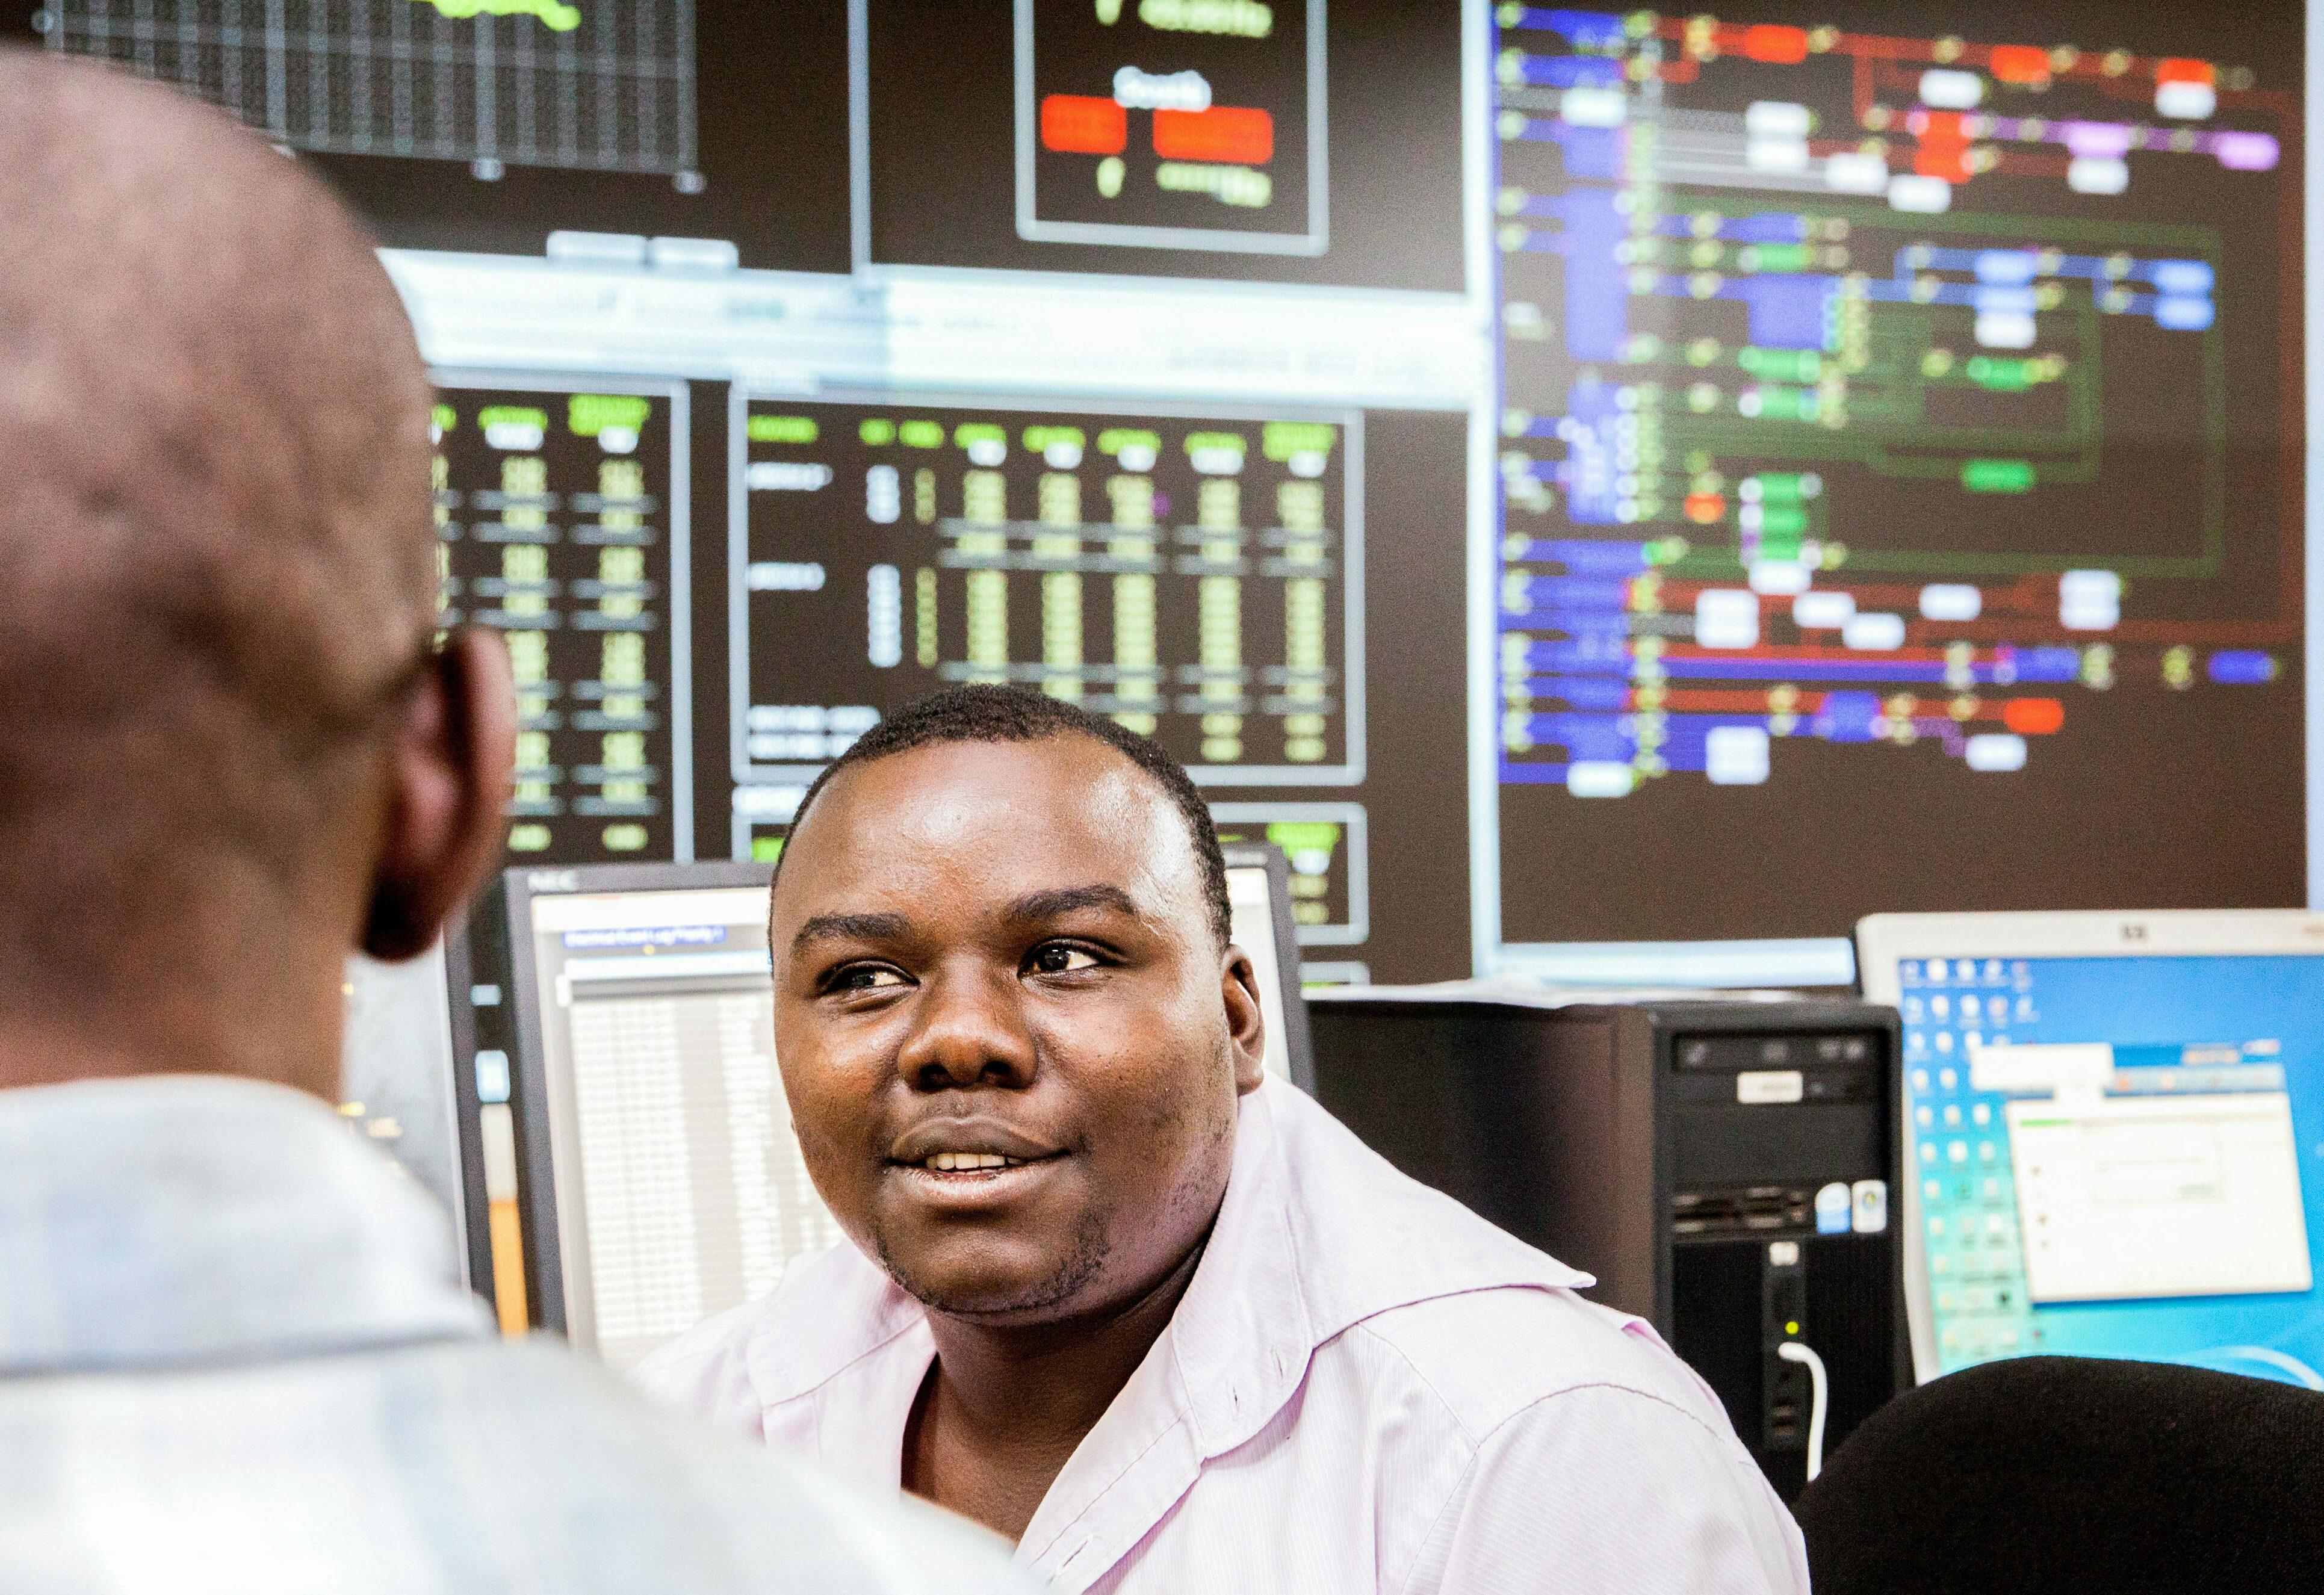 Ruanda Computerterminal 2021 05 03 091924